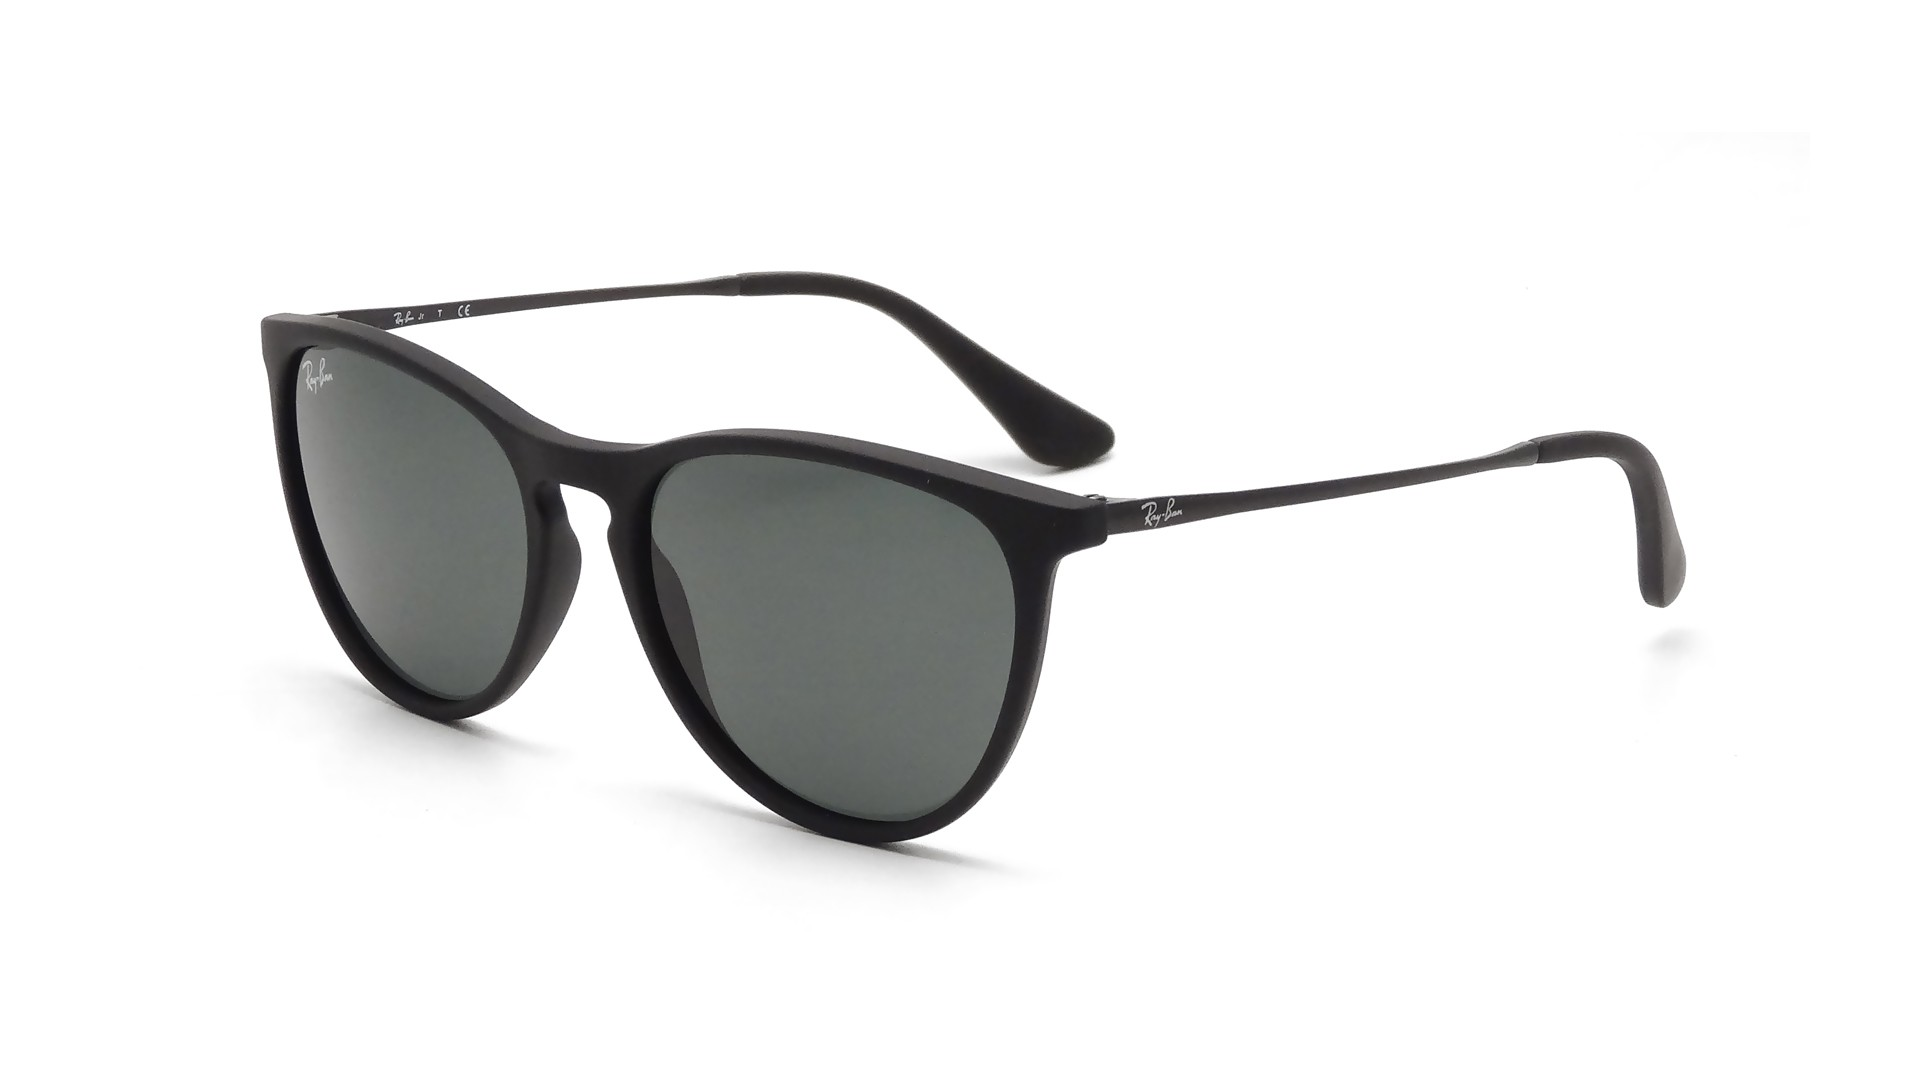 e78204a06f Sunglasses Ray-Ban Erika Black RJ9060S 7005 71 50-15 Junior